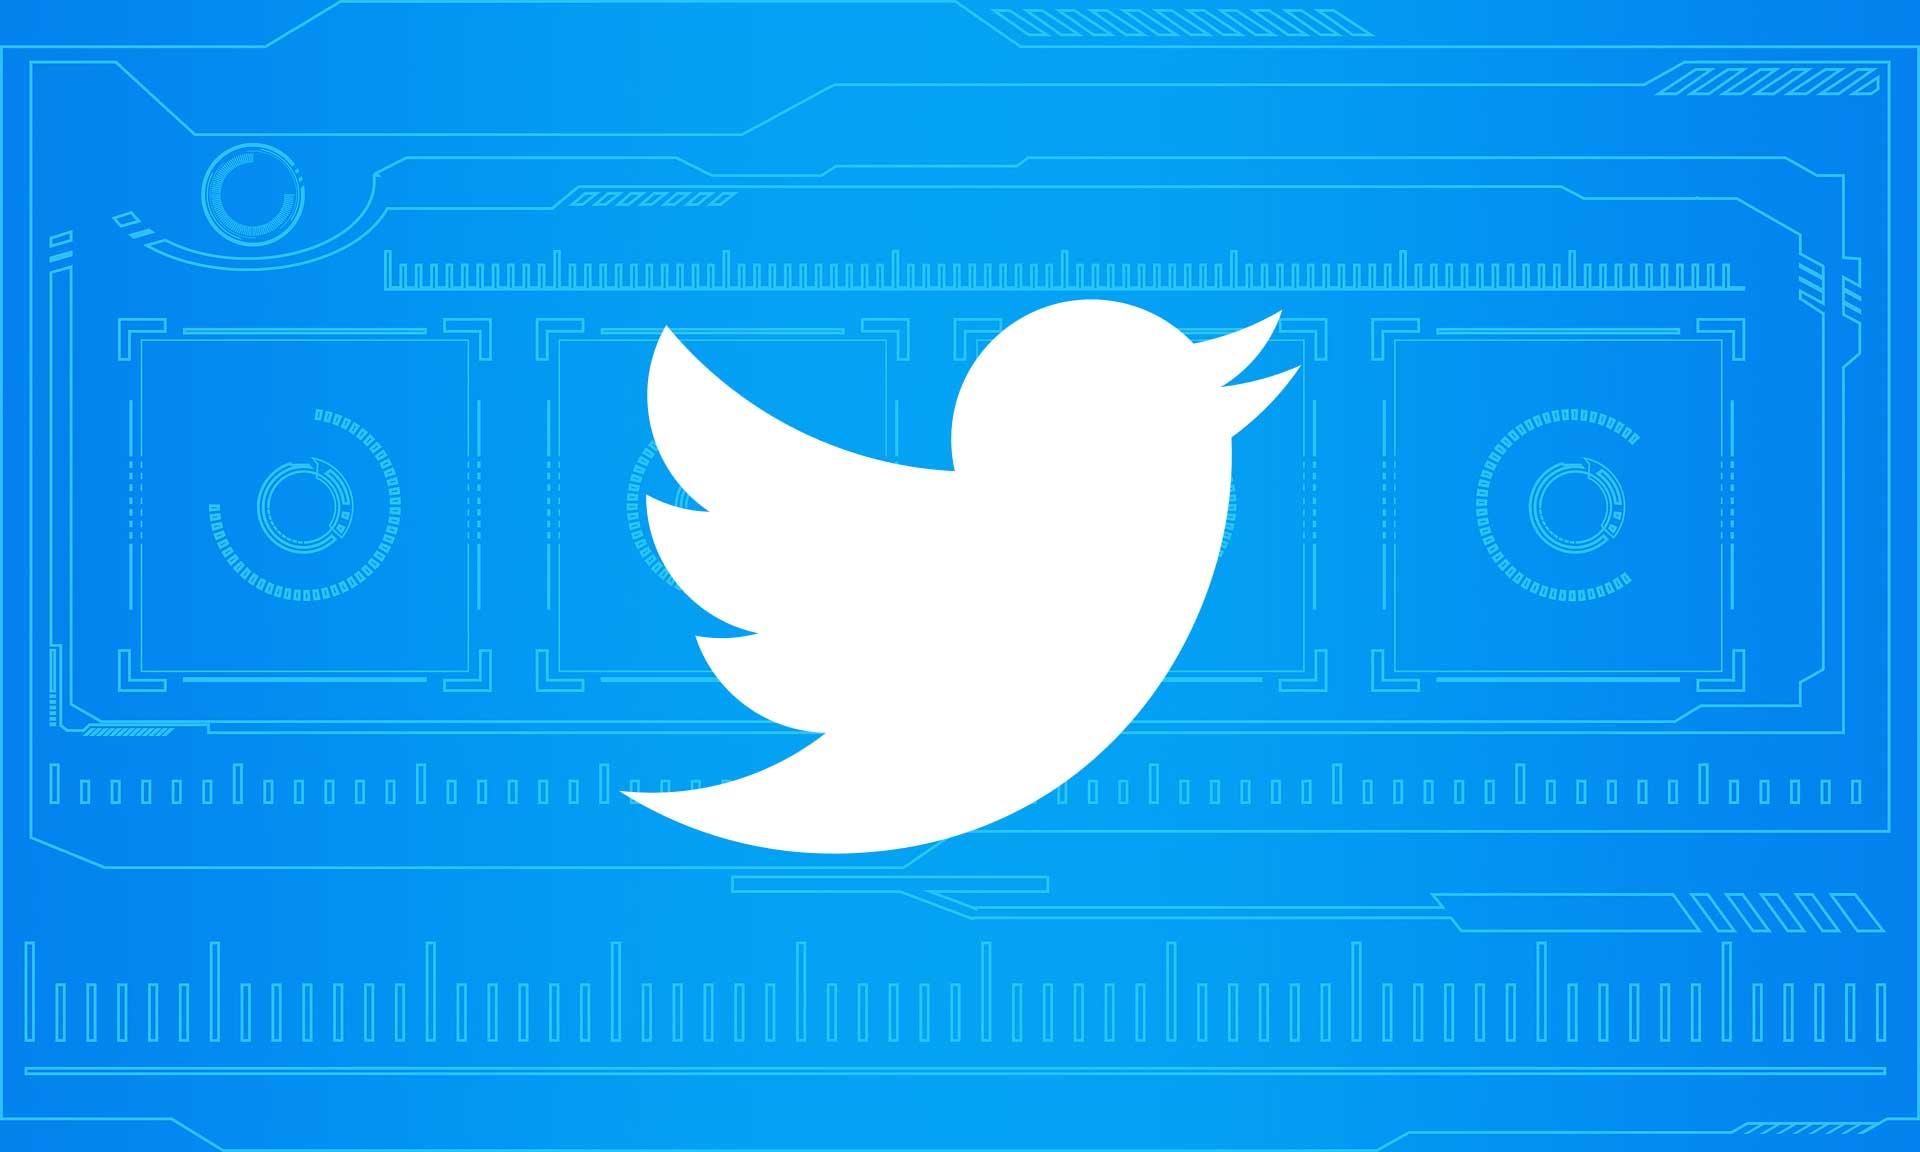 Jack dorseys original blueprint for twitter twitter blueprint malvernweather Images